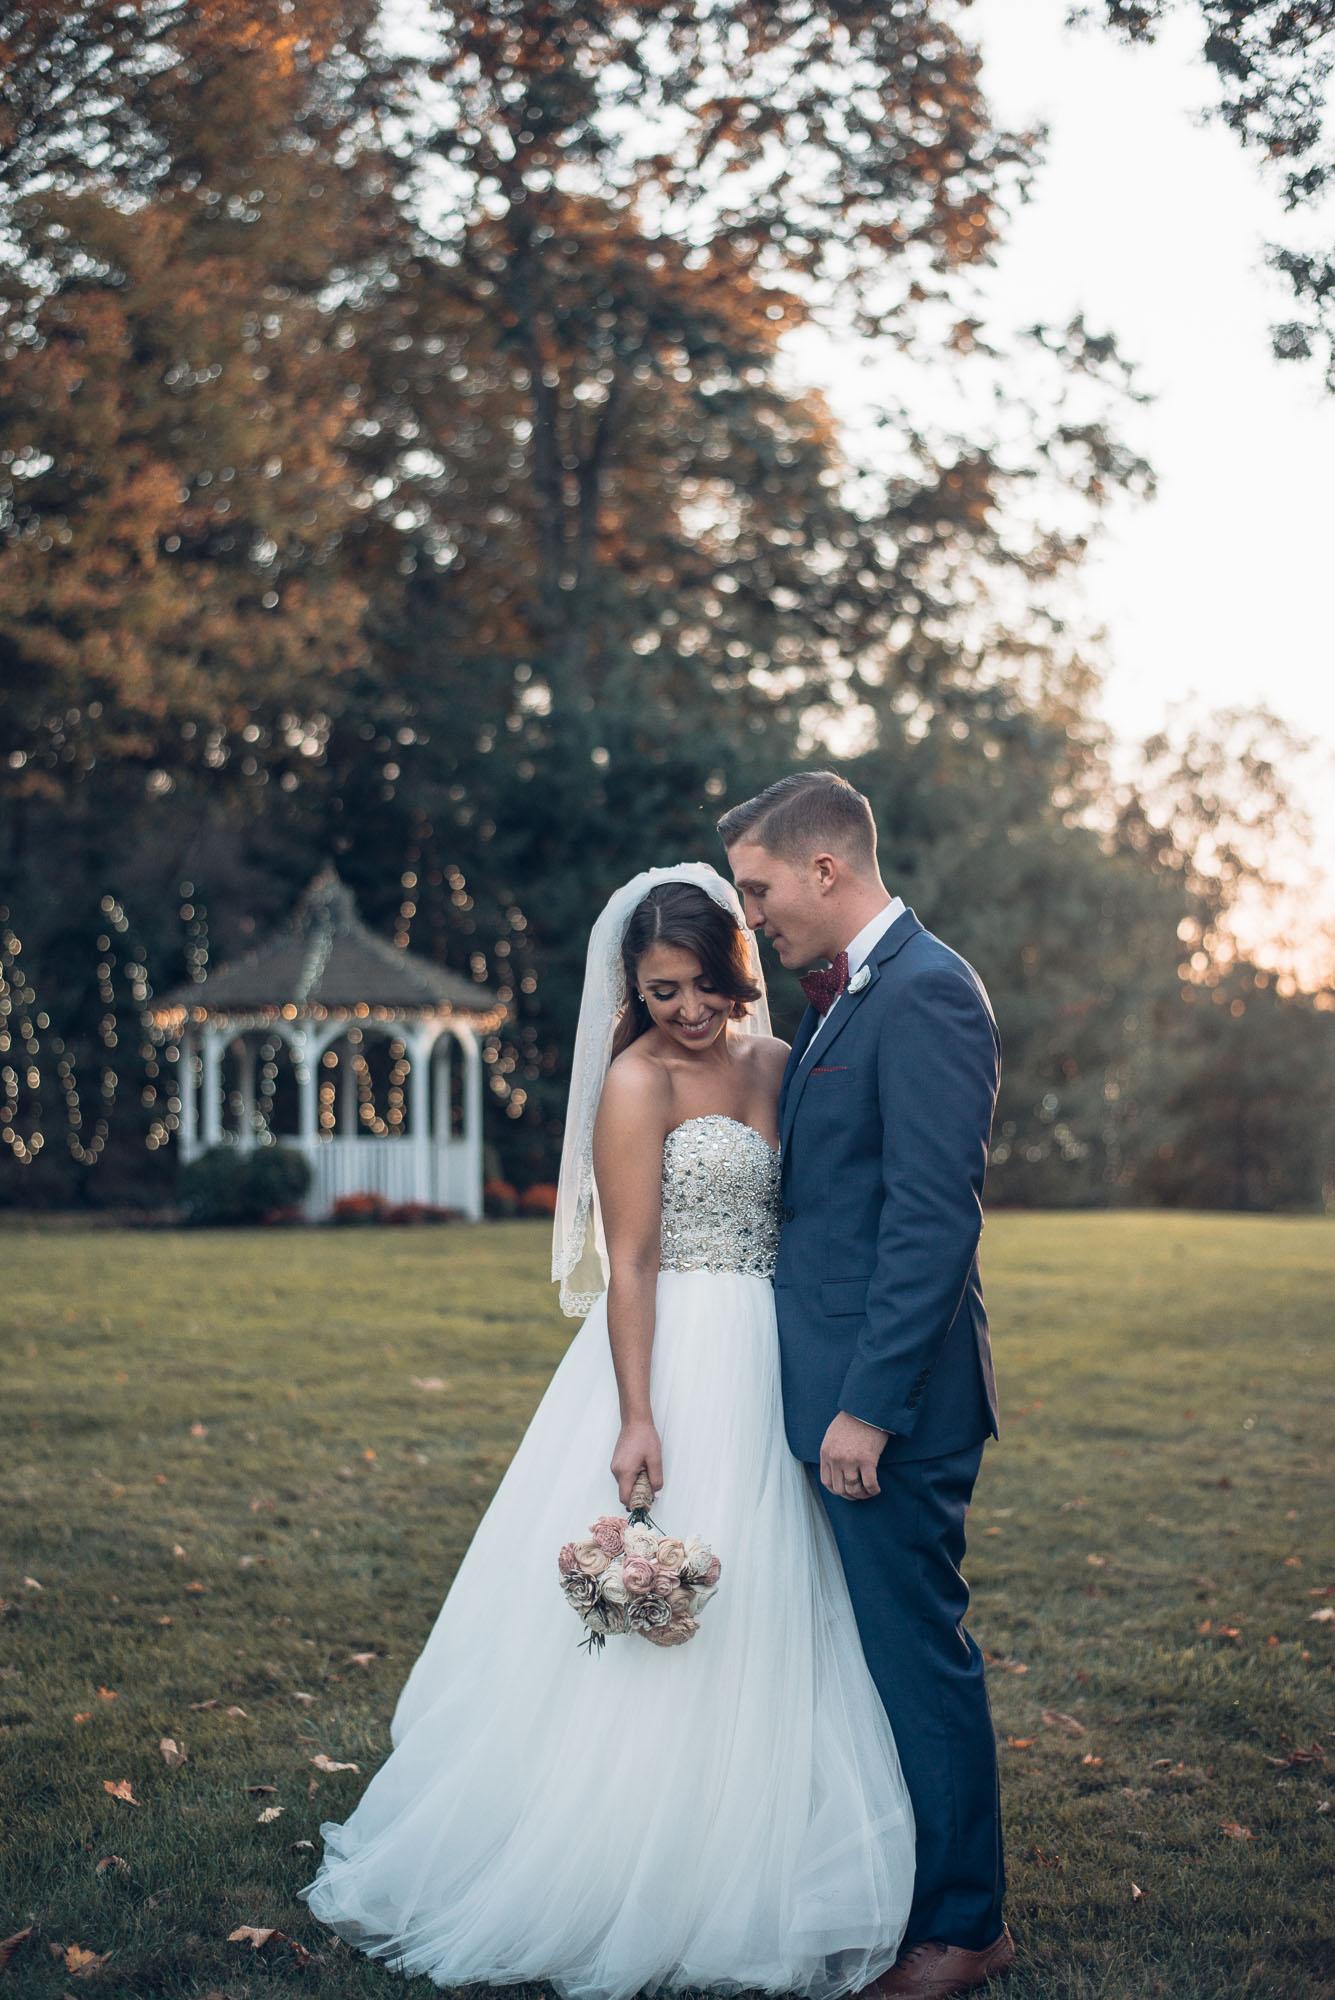 woodwinds_wedding_171020_web-37.jpg